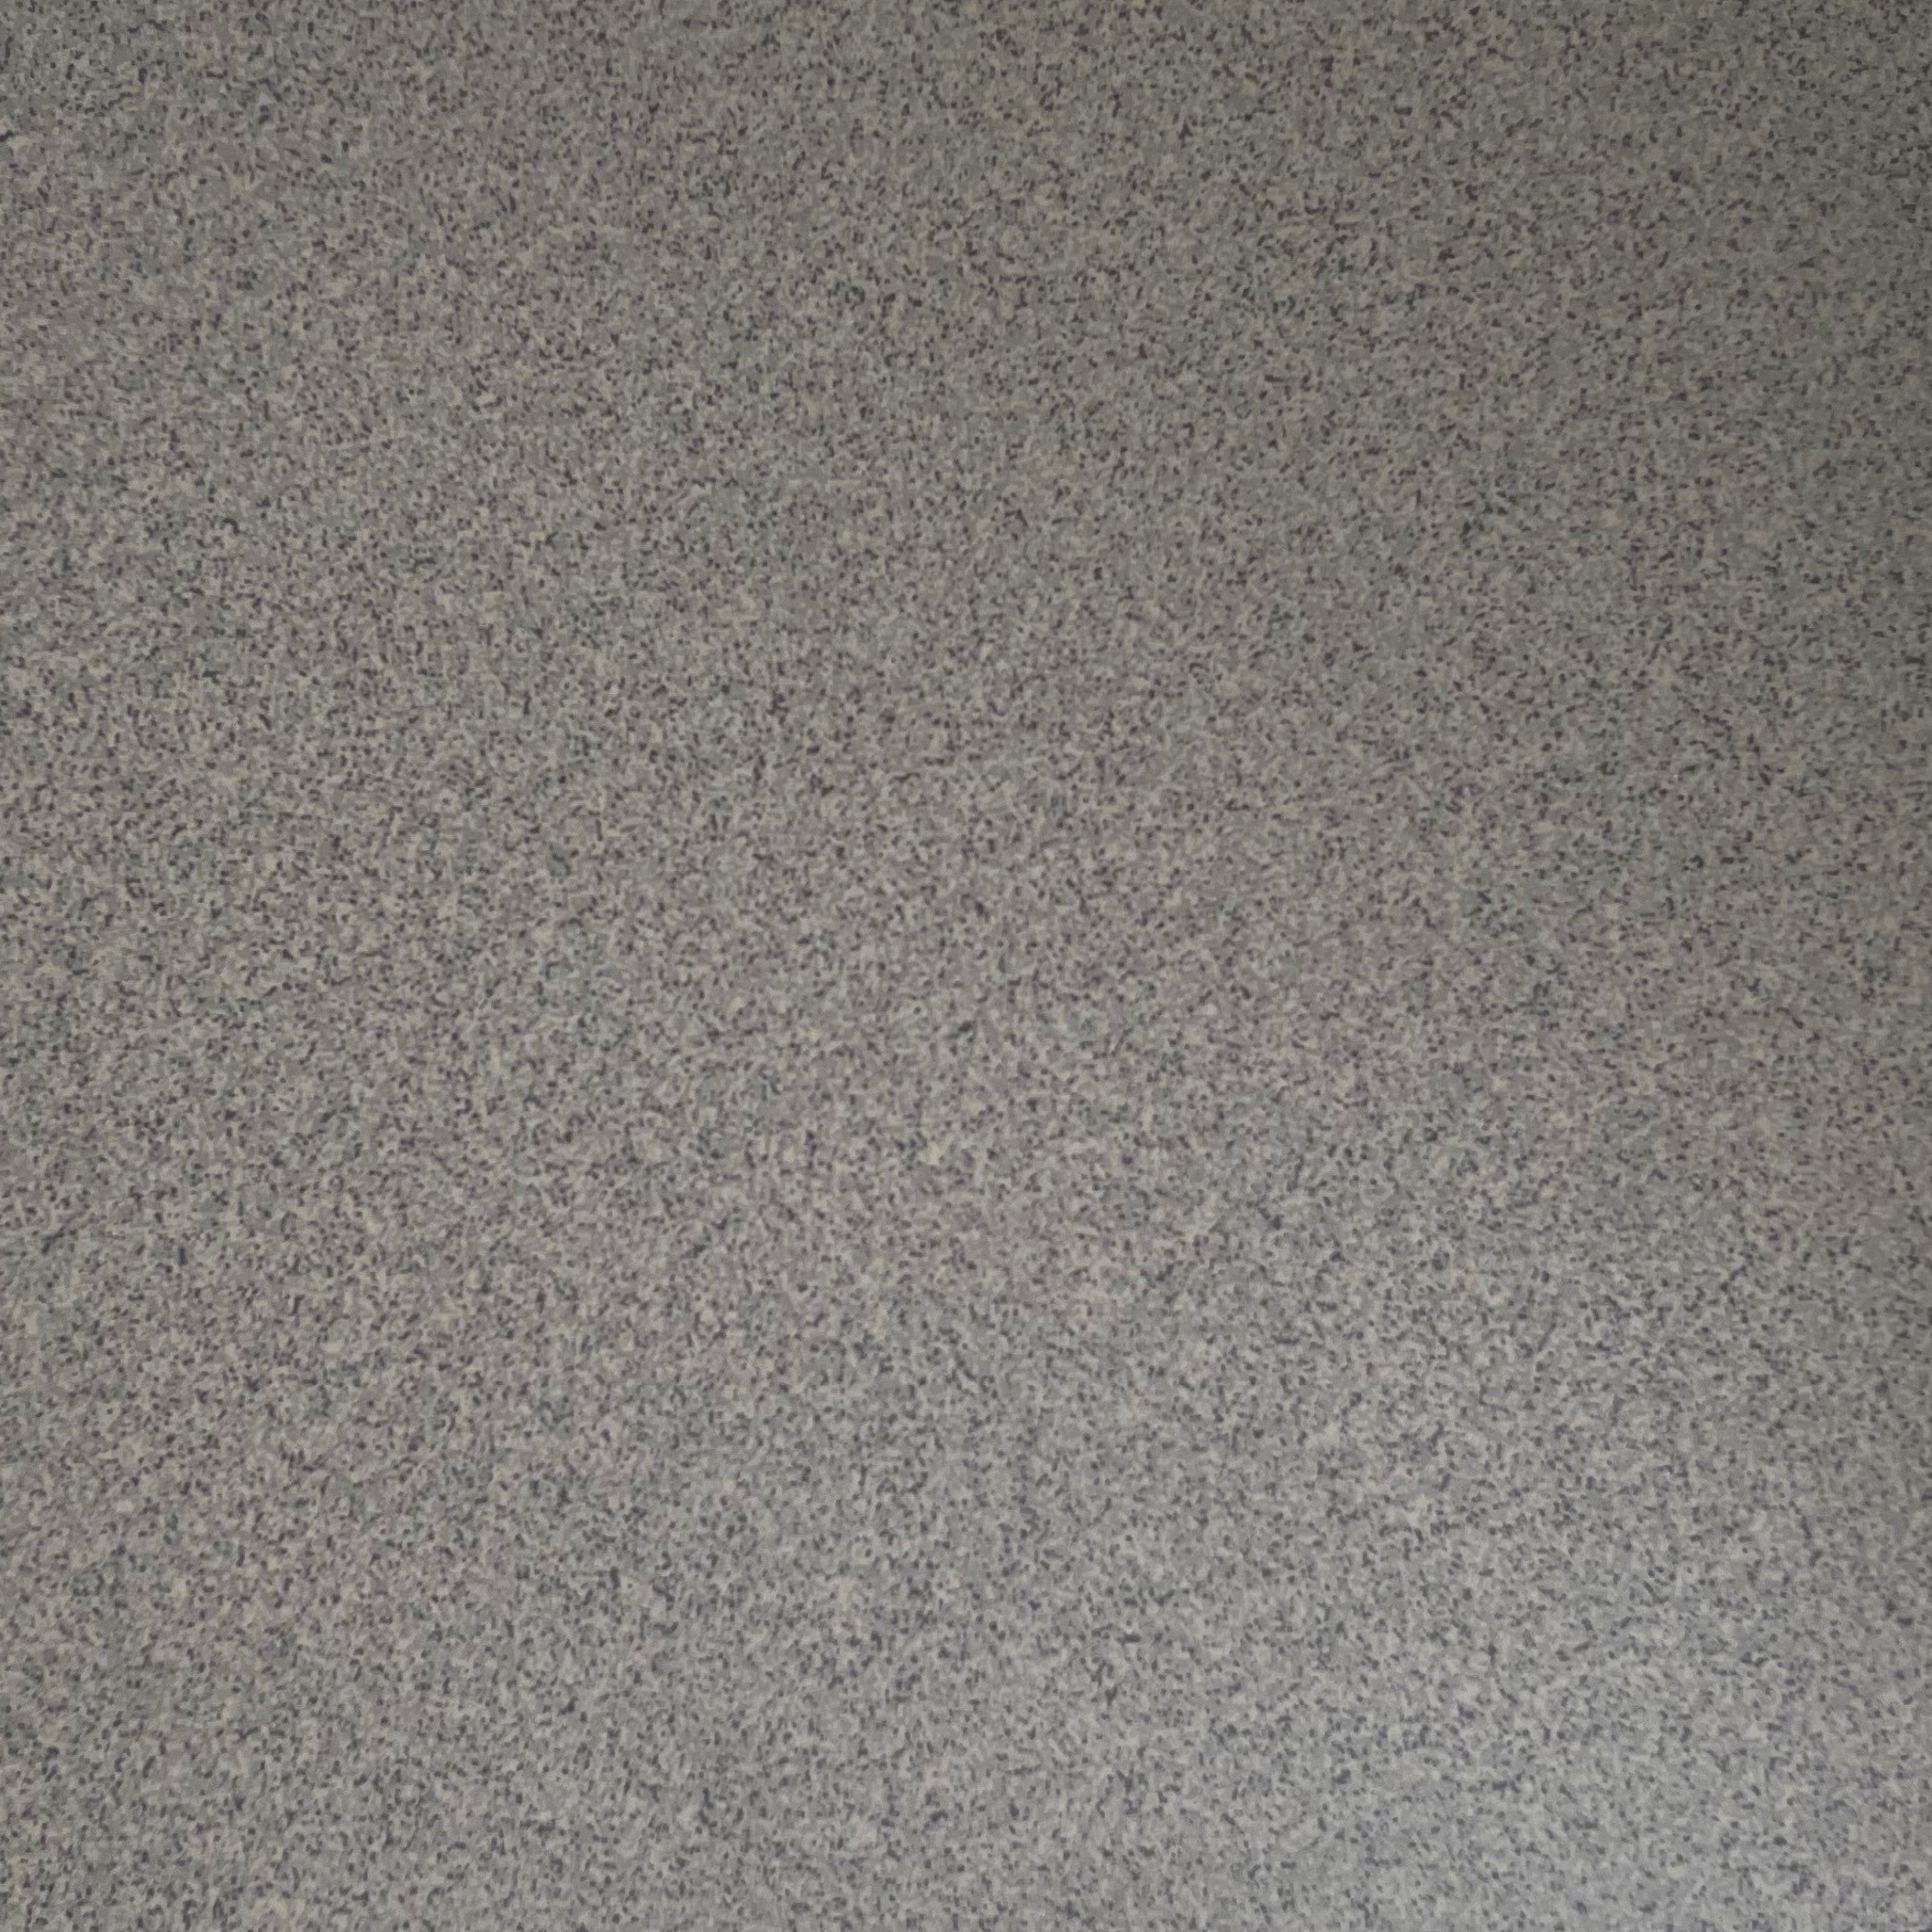 MPS Pandora Everest grau 30x30cm Bodenfliese R10